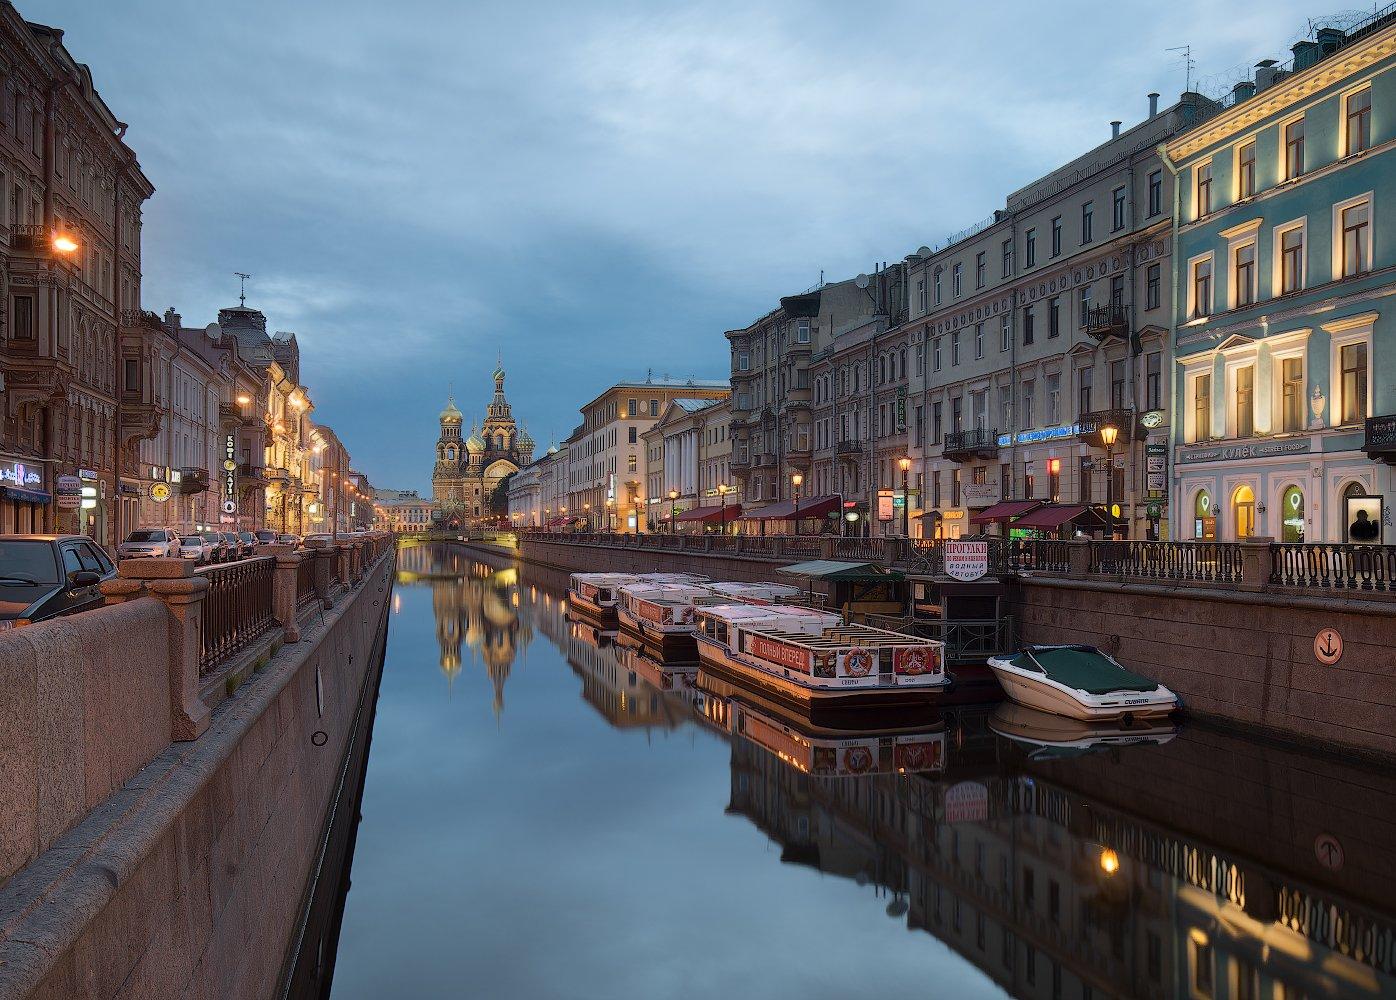 Отражение, Санкт петербург, Утро, Храм, Sergey Louks